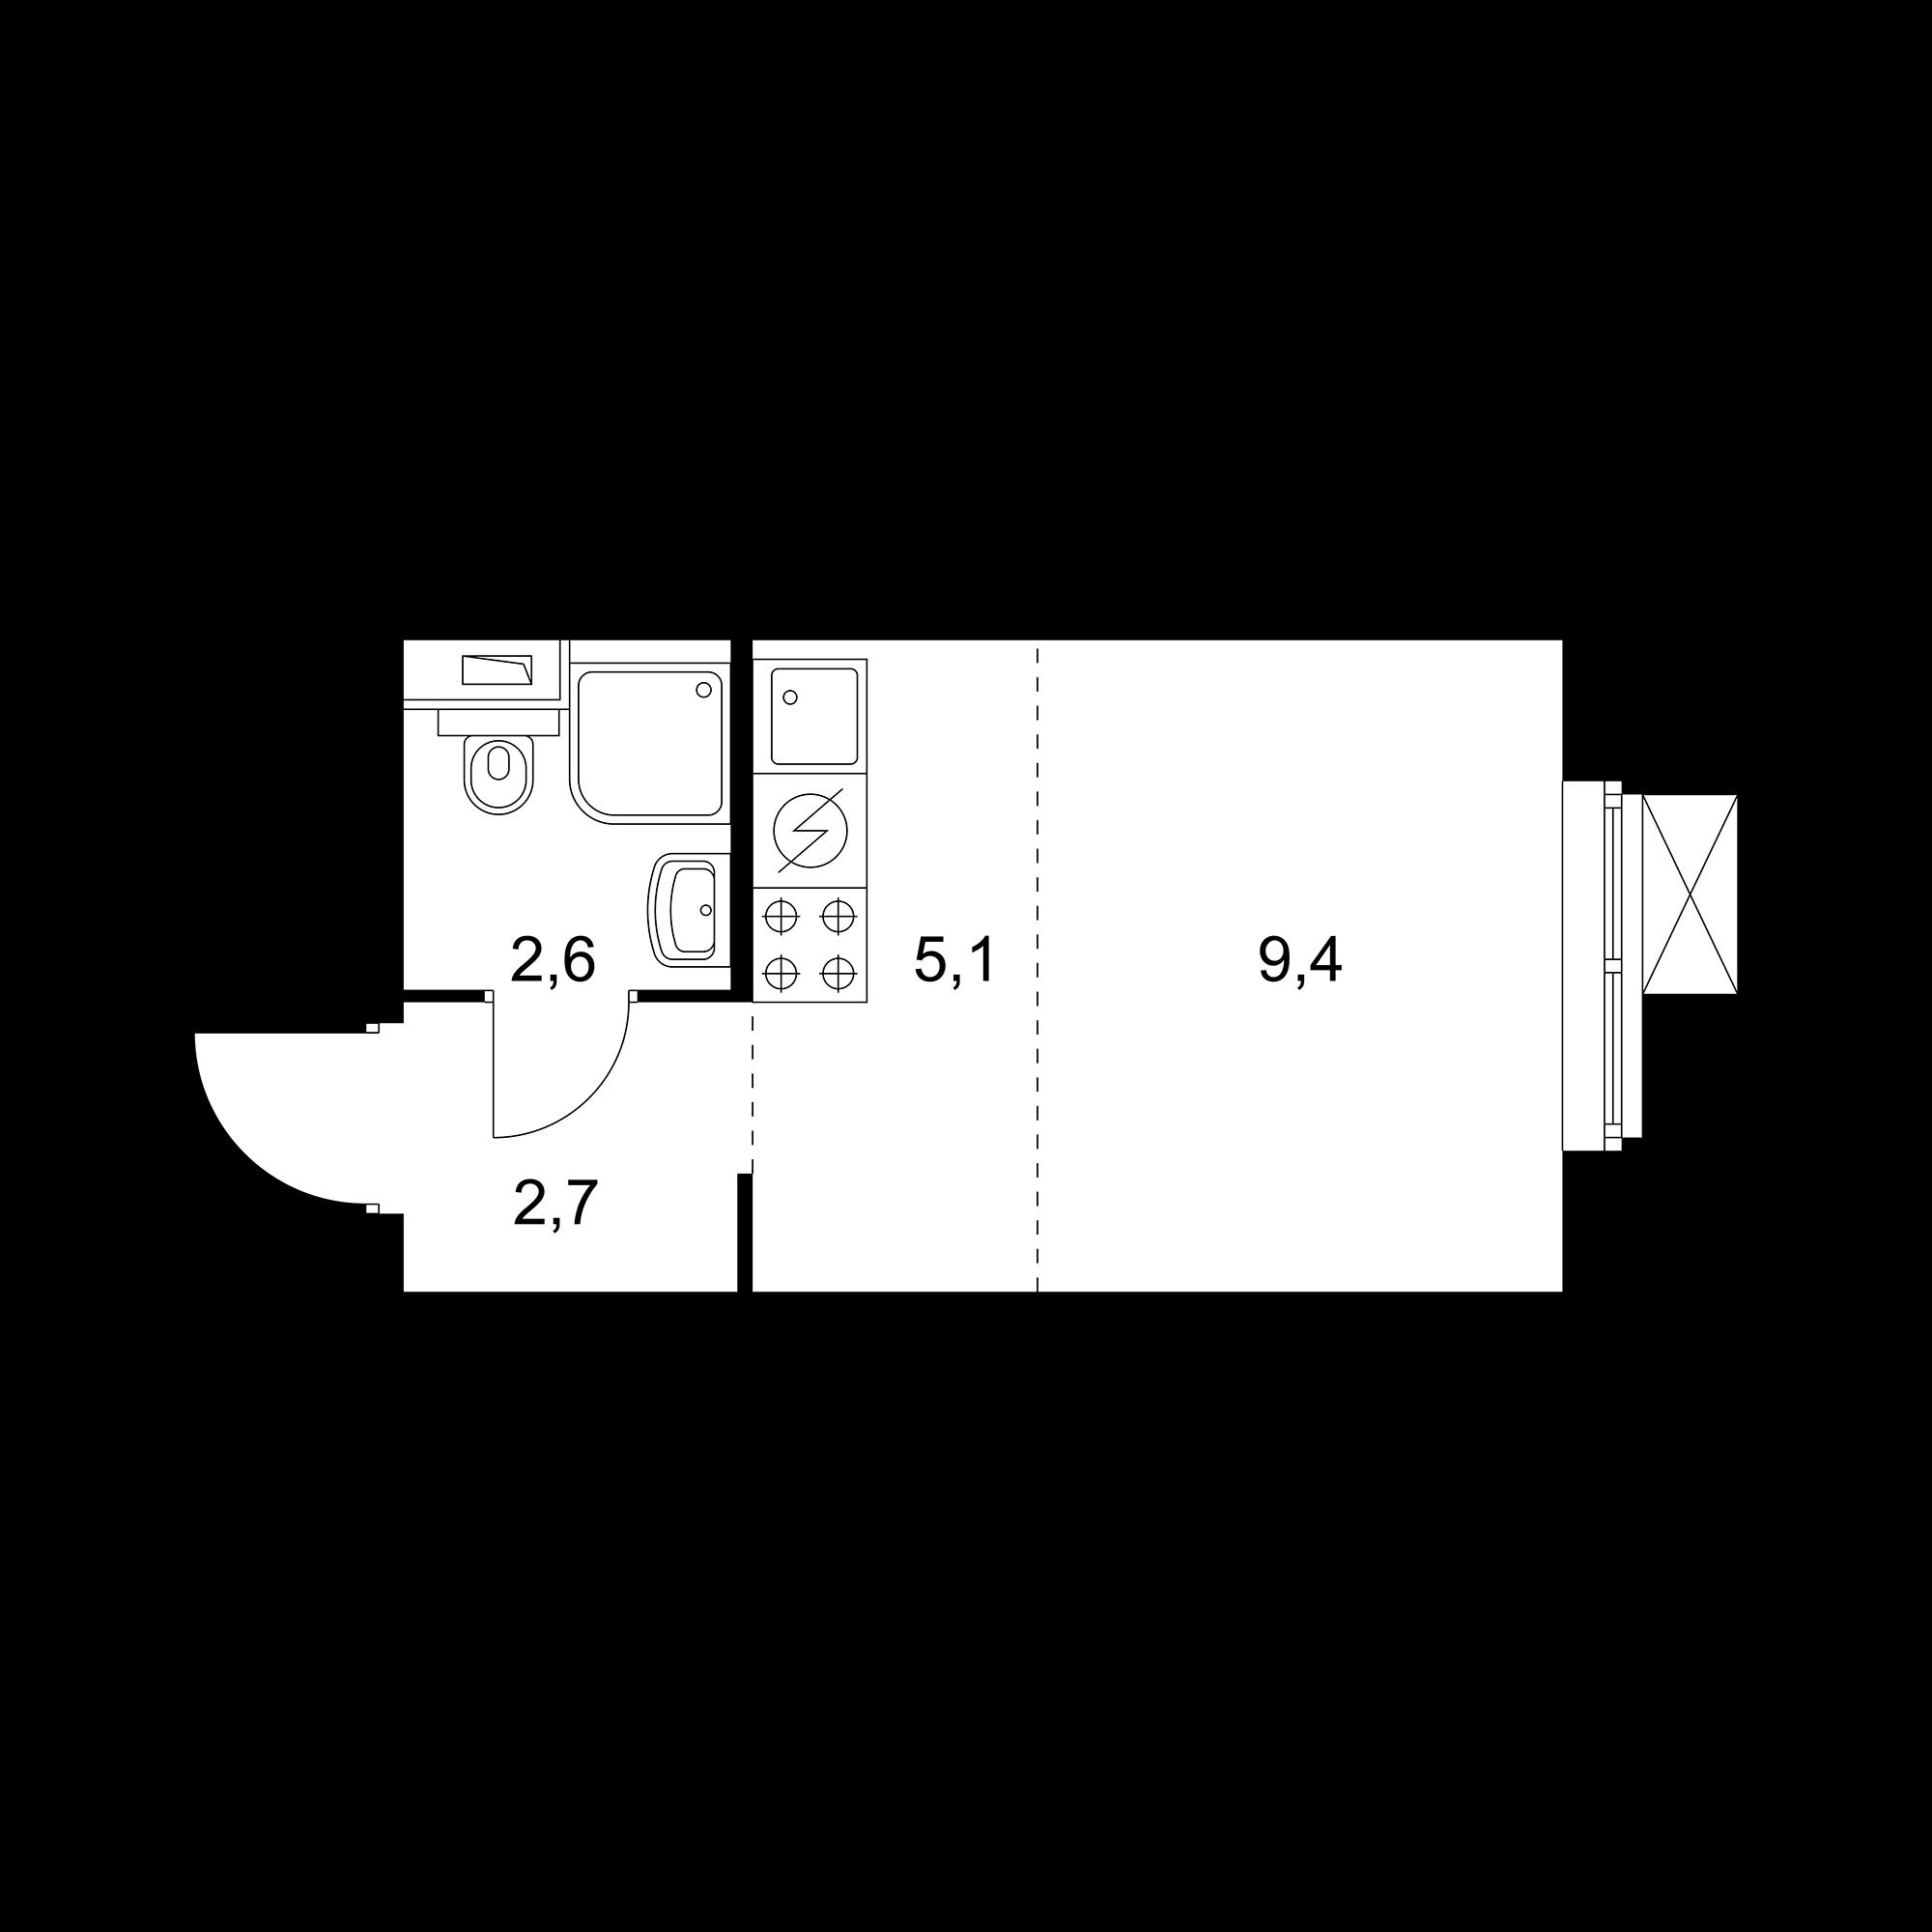 1NS1_3.6-1_2